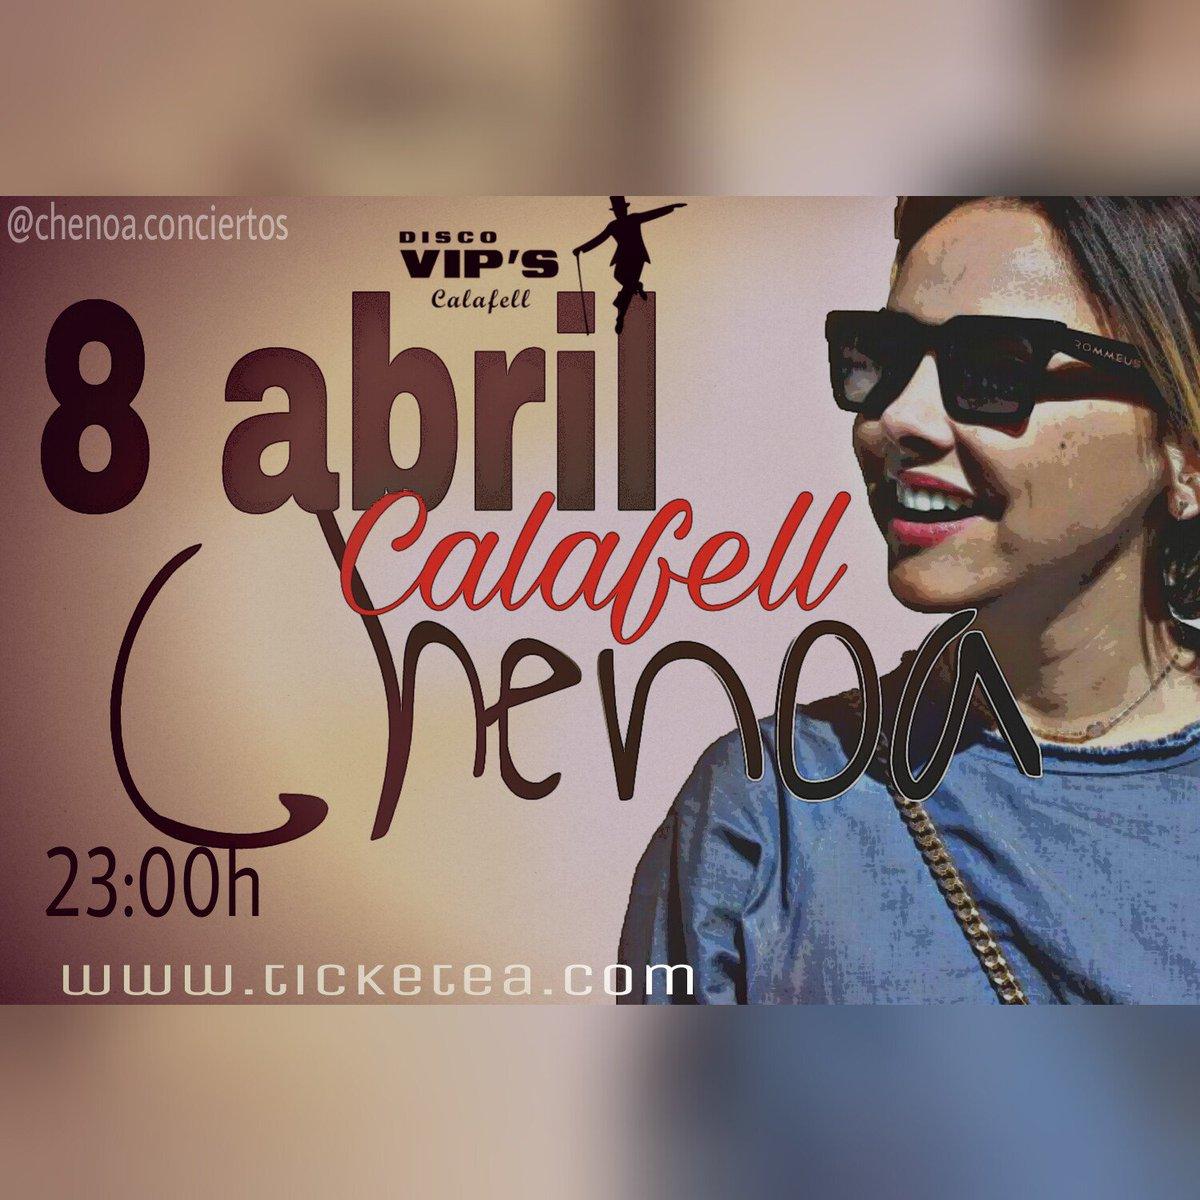 PRÓXIMO CONCIERTO: 8 de abril #CALAFELL  El tour #SoyHumana de @Chenoaoficial llega a la @disco_vips Entradas:  https://www. ticketea.com/entradas-conci erto-chenoa-en-concierto/?tktsrc=search &nbsp; … <br>http://pic.twitter.com/rNFK2Pjlqk